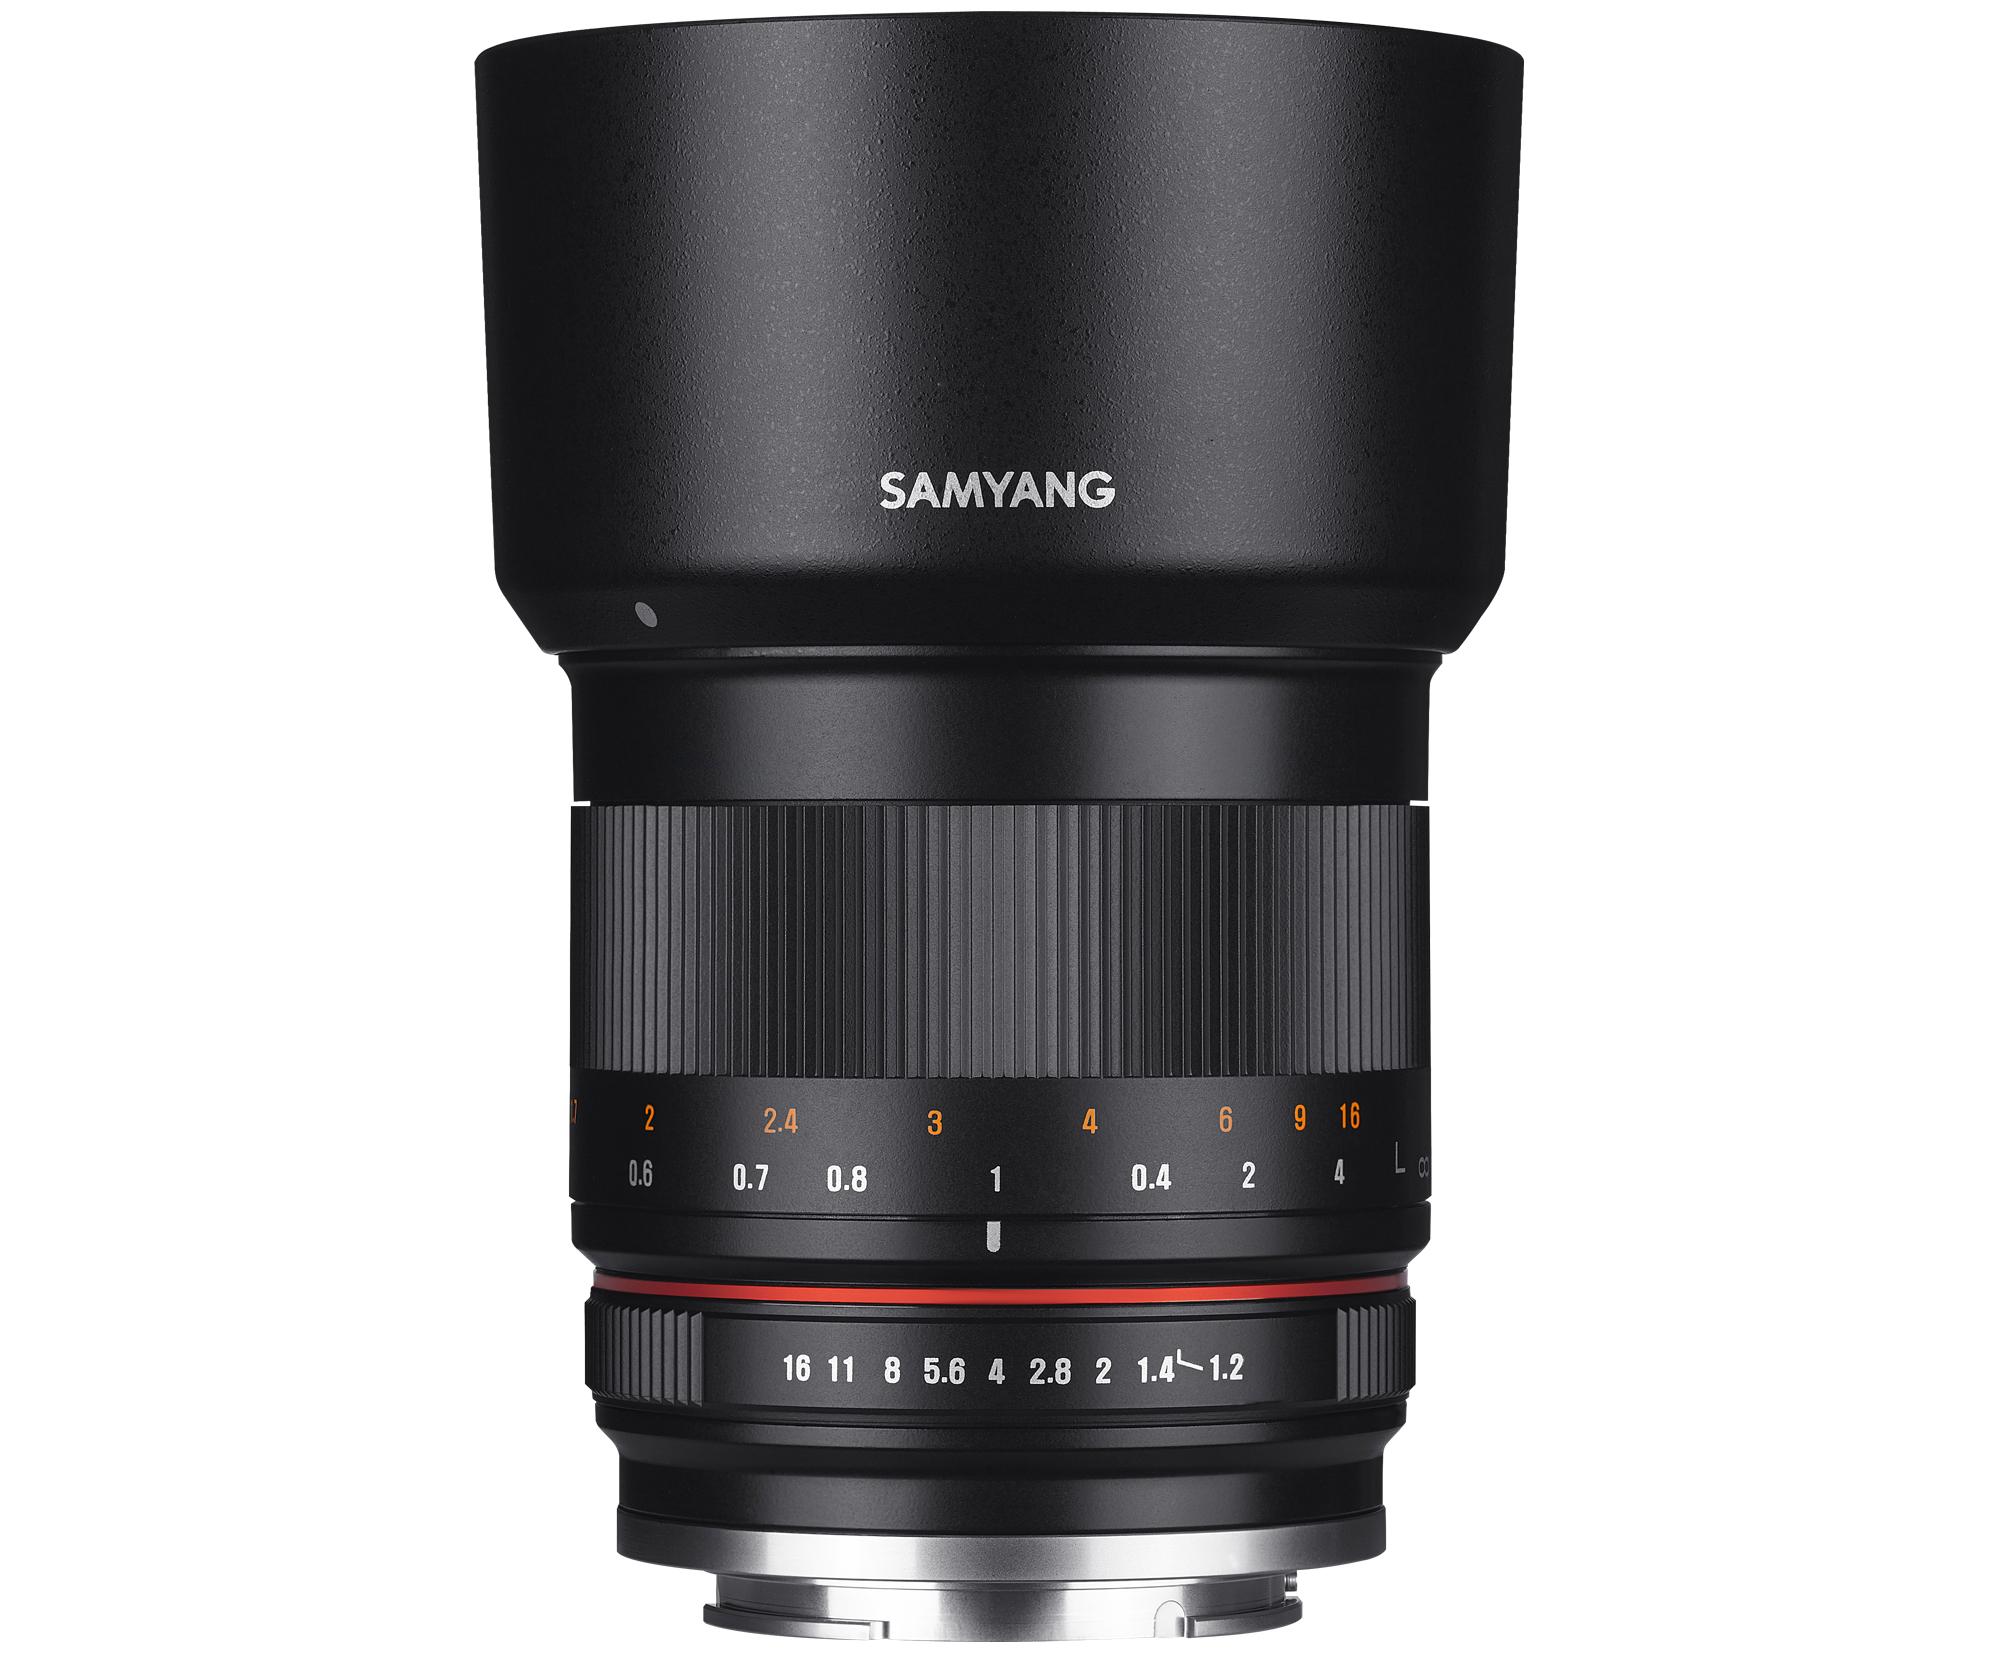 SAMYANG 50mm F1.2 AS UMC CS   ※在庫お問い合わせください